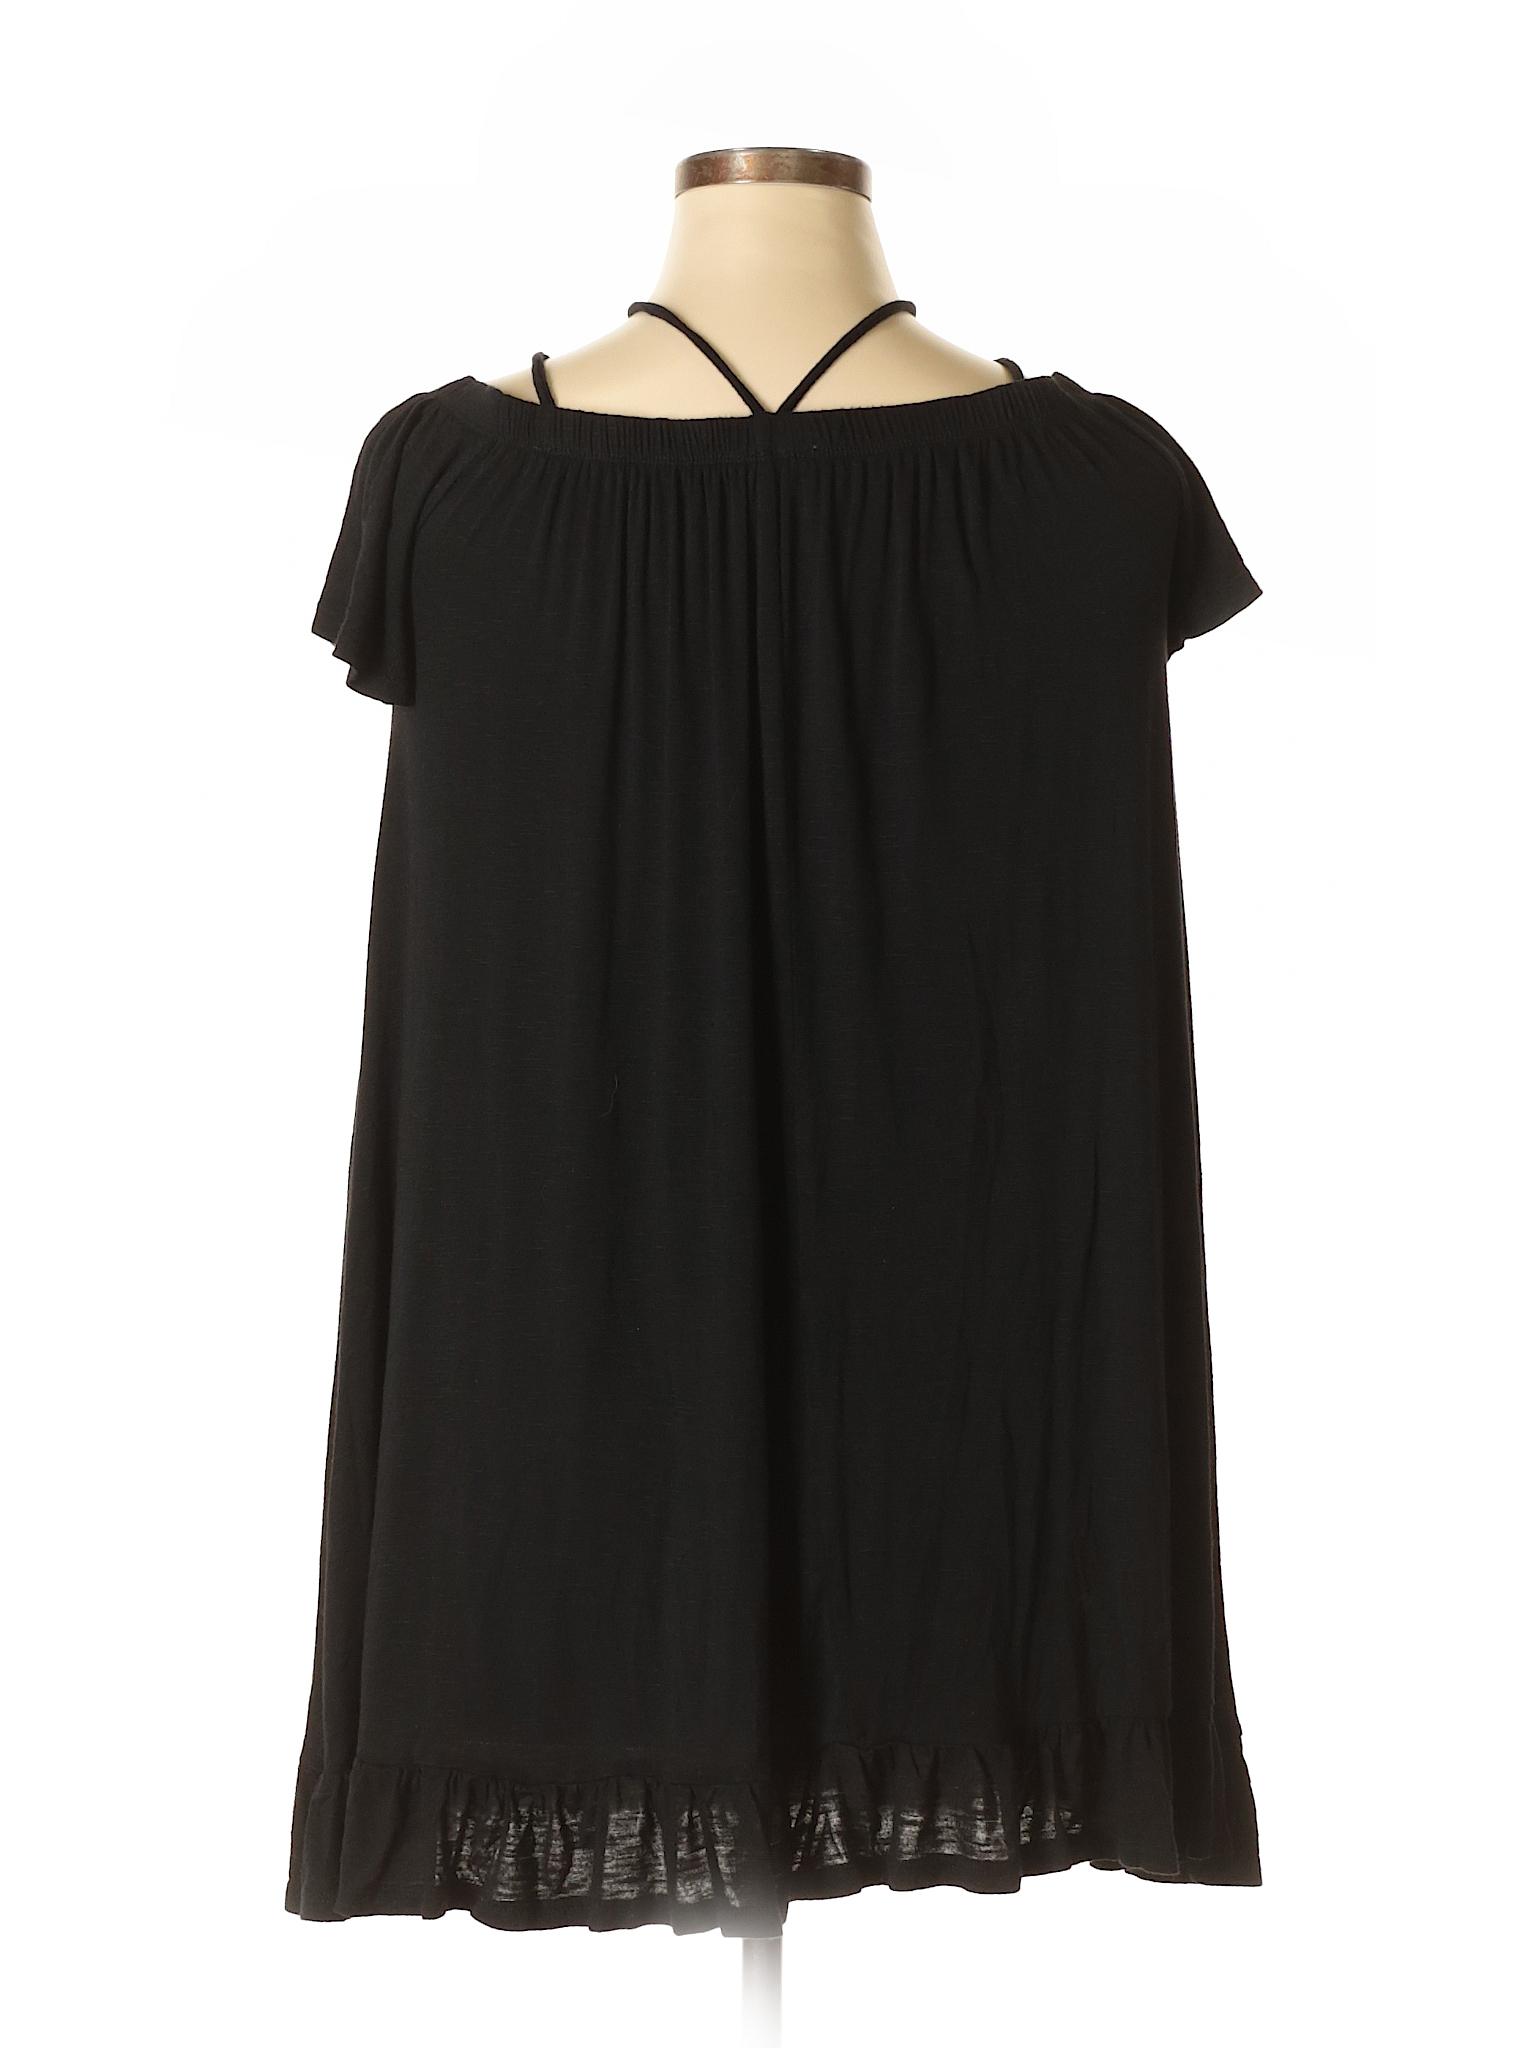 Boutique Boutique Dress Winter Winter Casual Dress Boutique Casual Jodifl Winter Jodifl q1YaPw1r